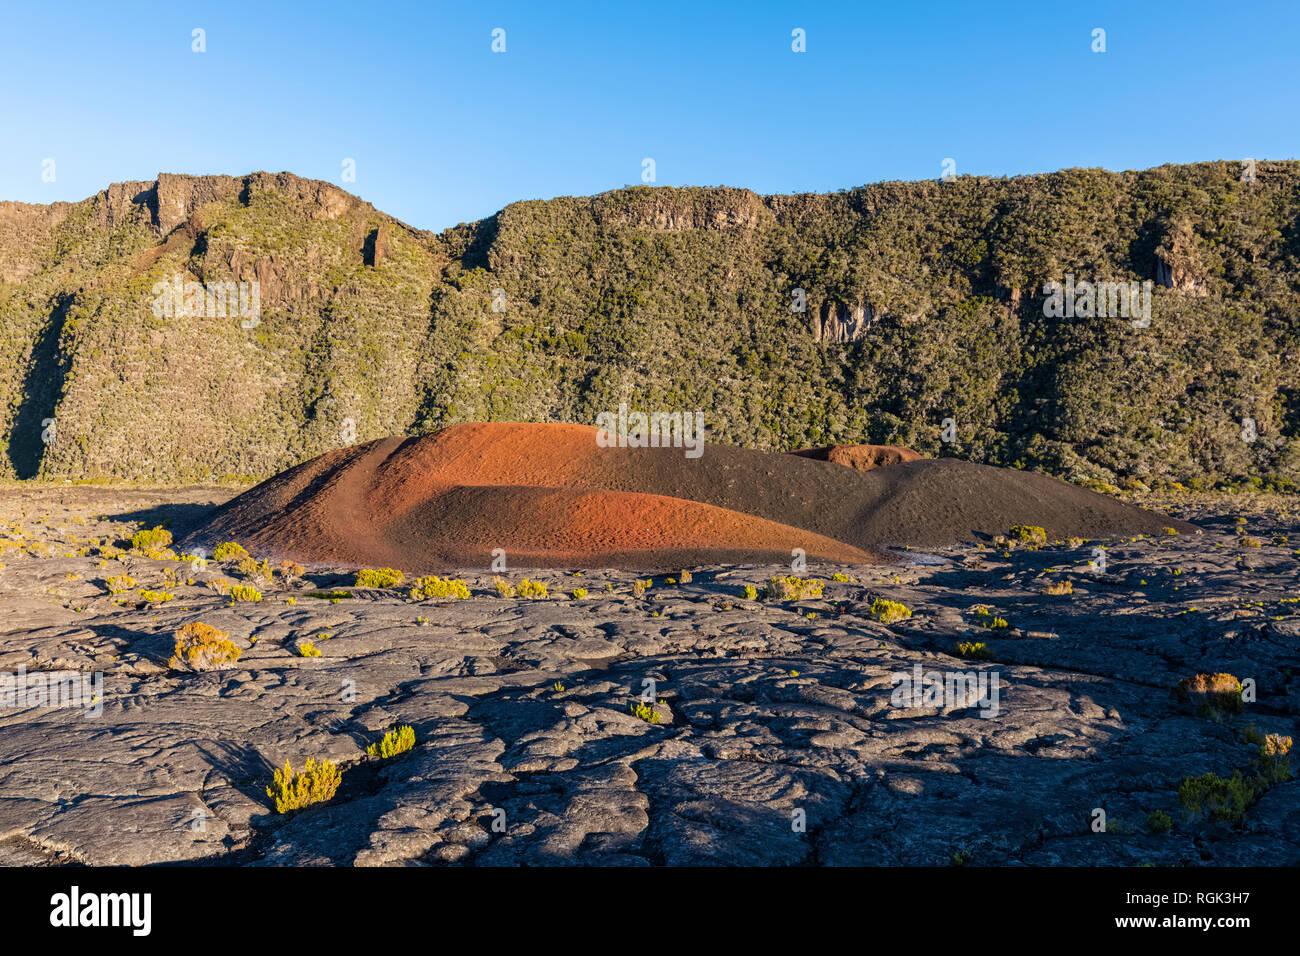 Reunion, Reunion National Park, Shield volcano Piton de la Fournaise, inner Caldera Enclos Fouque and edge of exterior caldera Rempart, lava field - Stock Image